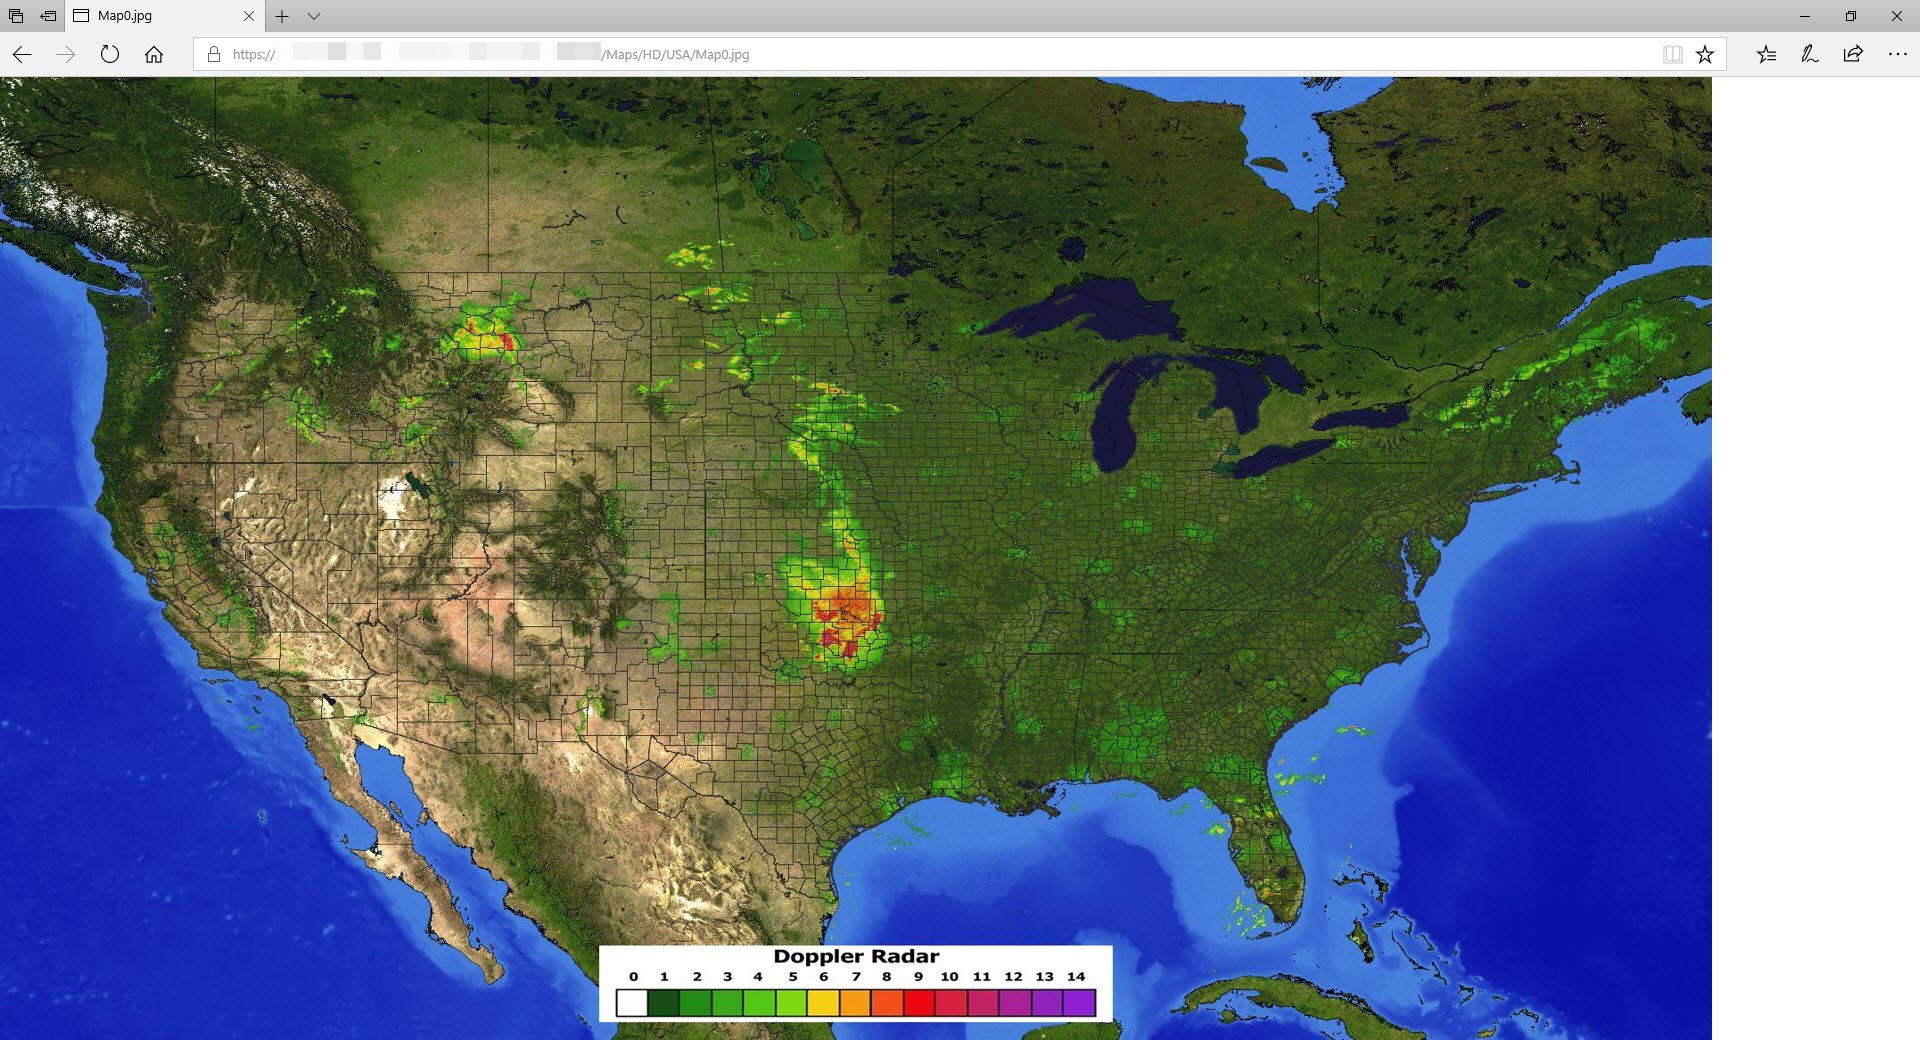 Live Doppler Radar Weather Map Image